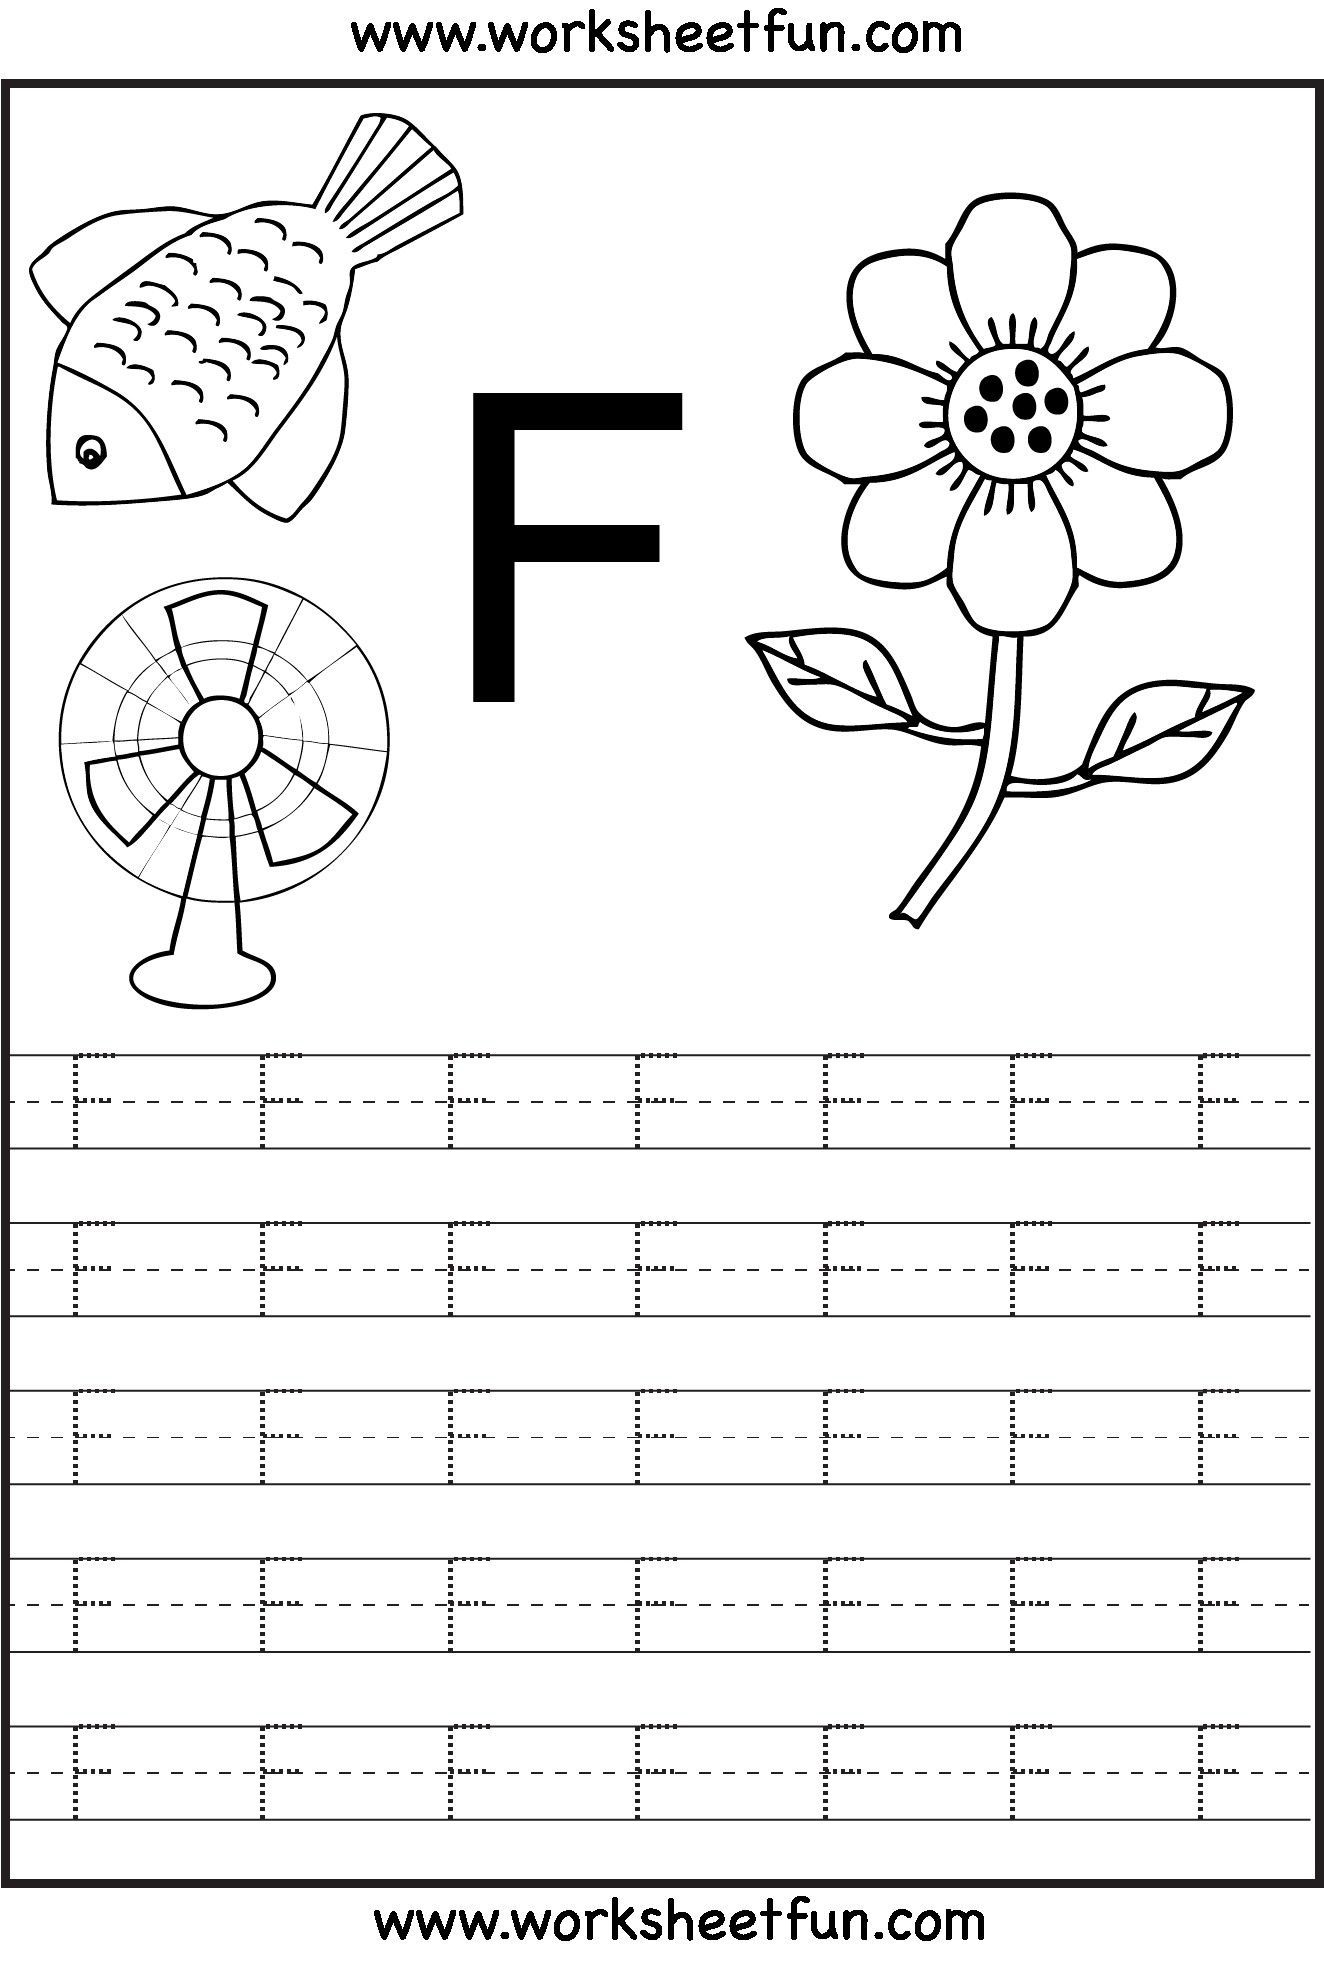 3 Cursive Writing Worksheets Letter M In Met